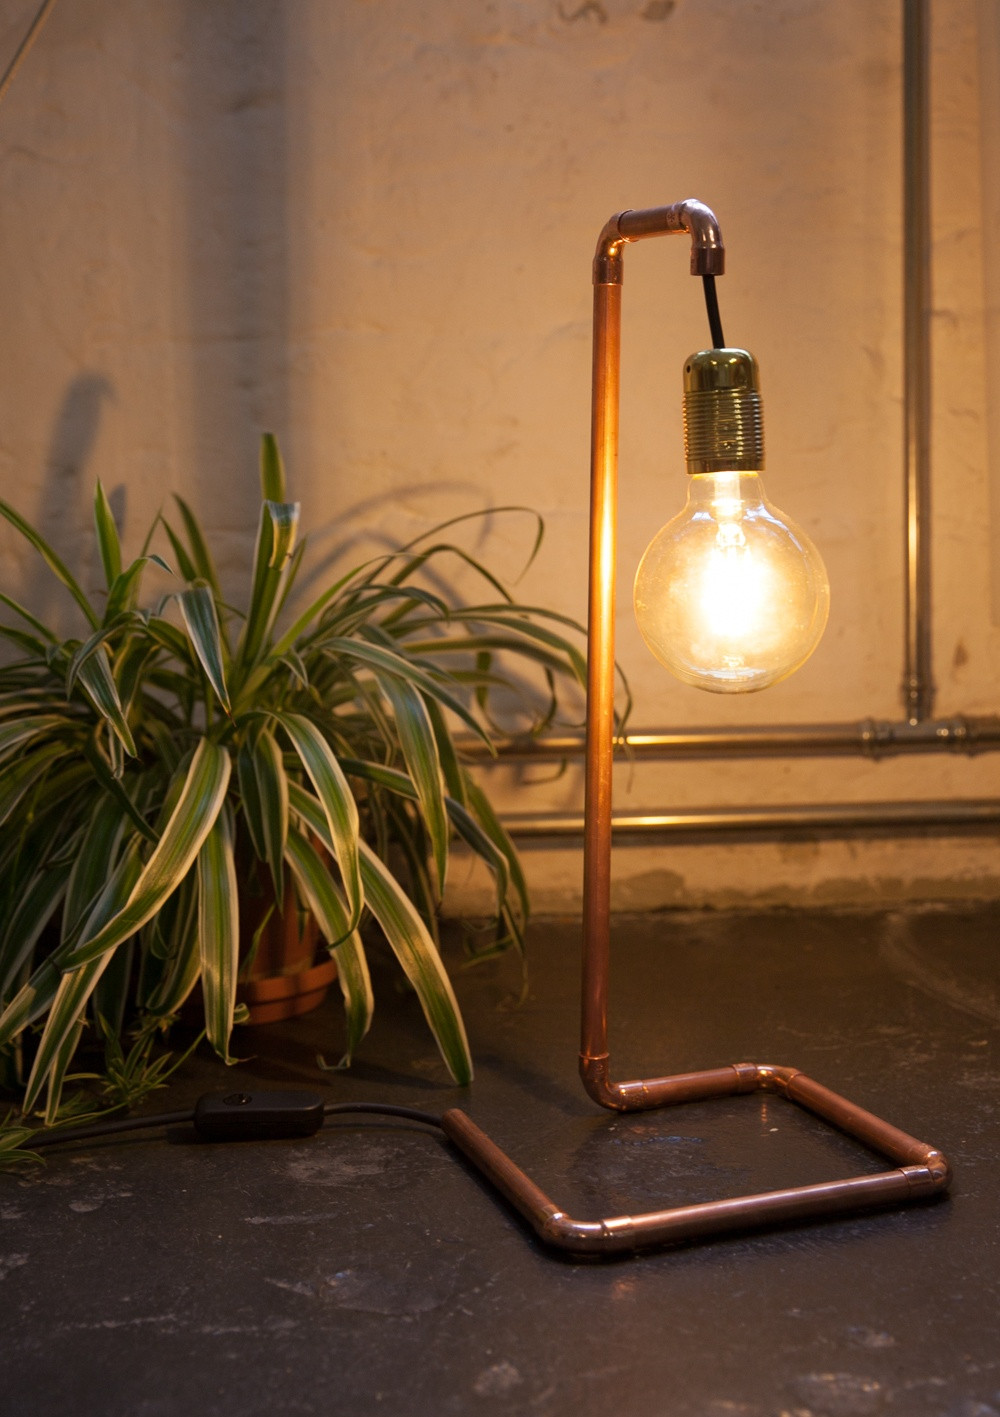 Lampe Diy  DIY Lampe im Industriedesign